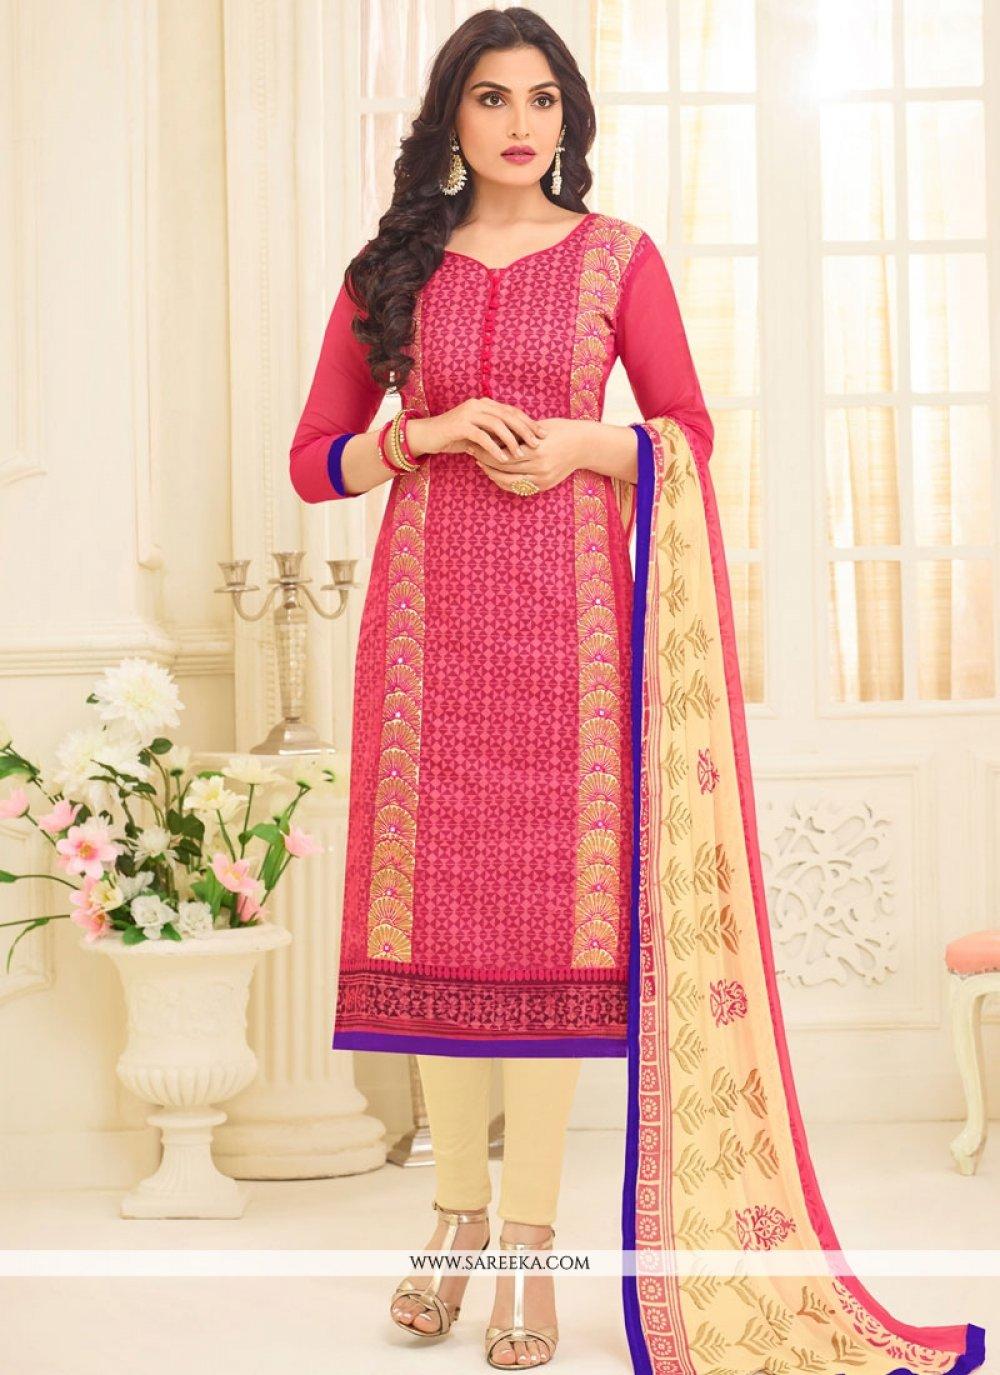 Chanderi Embroidered Work Churidar Suit